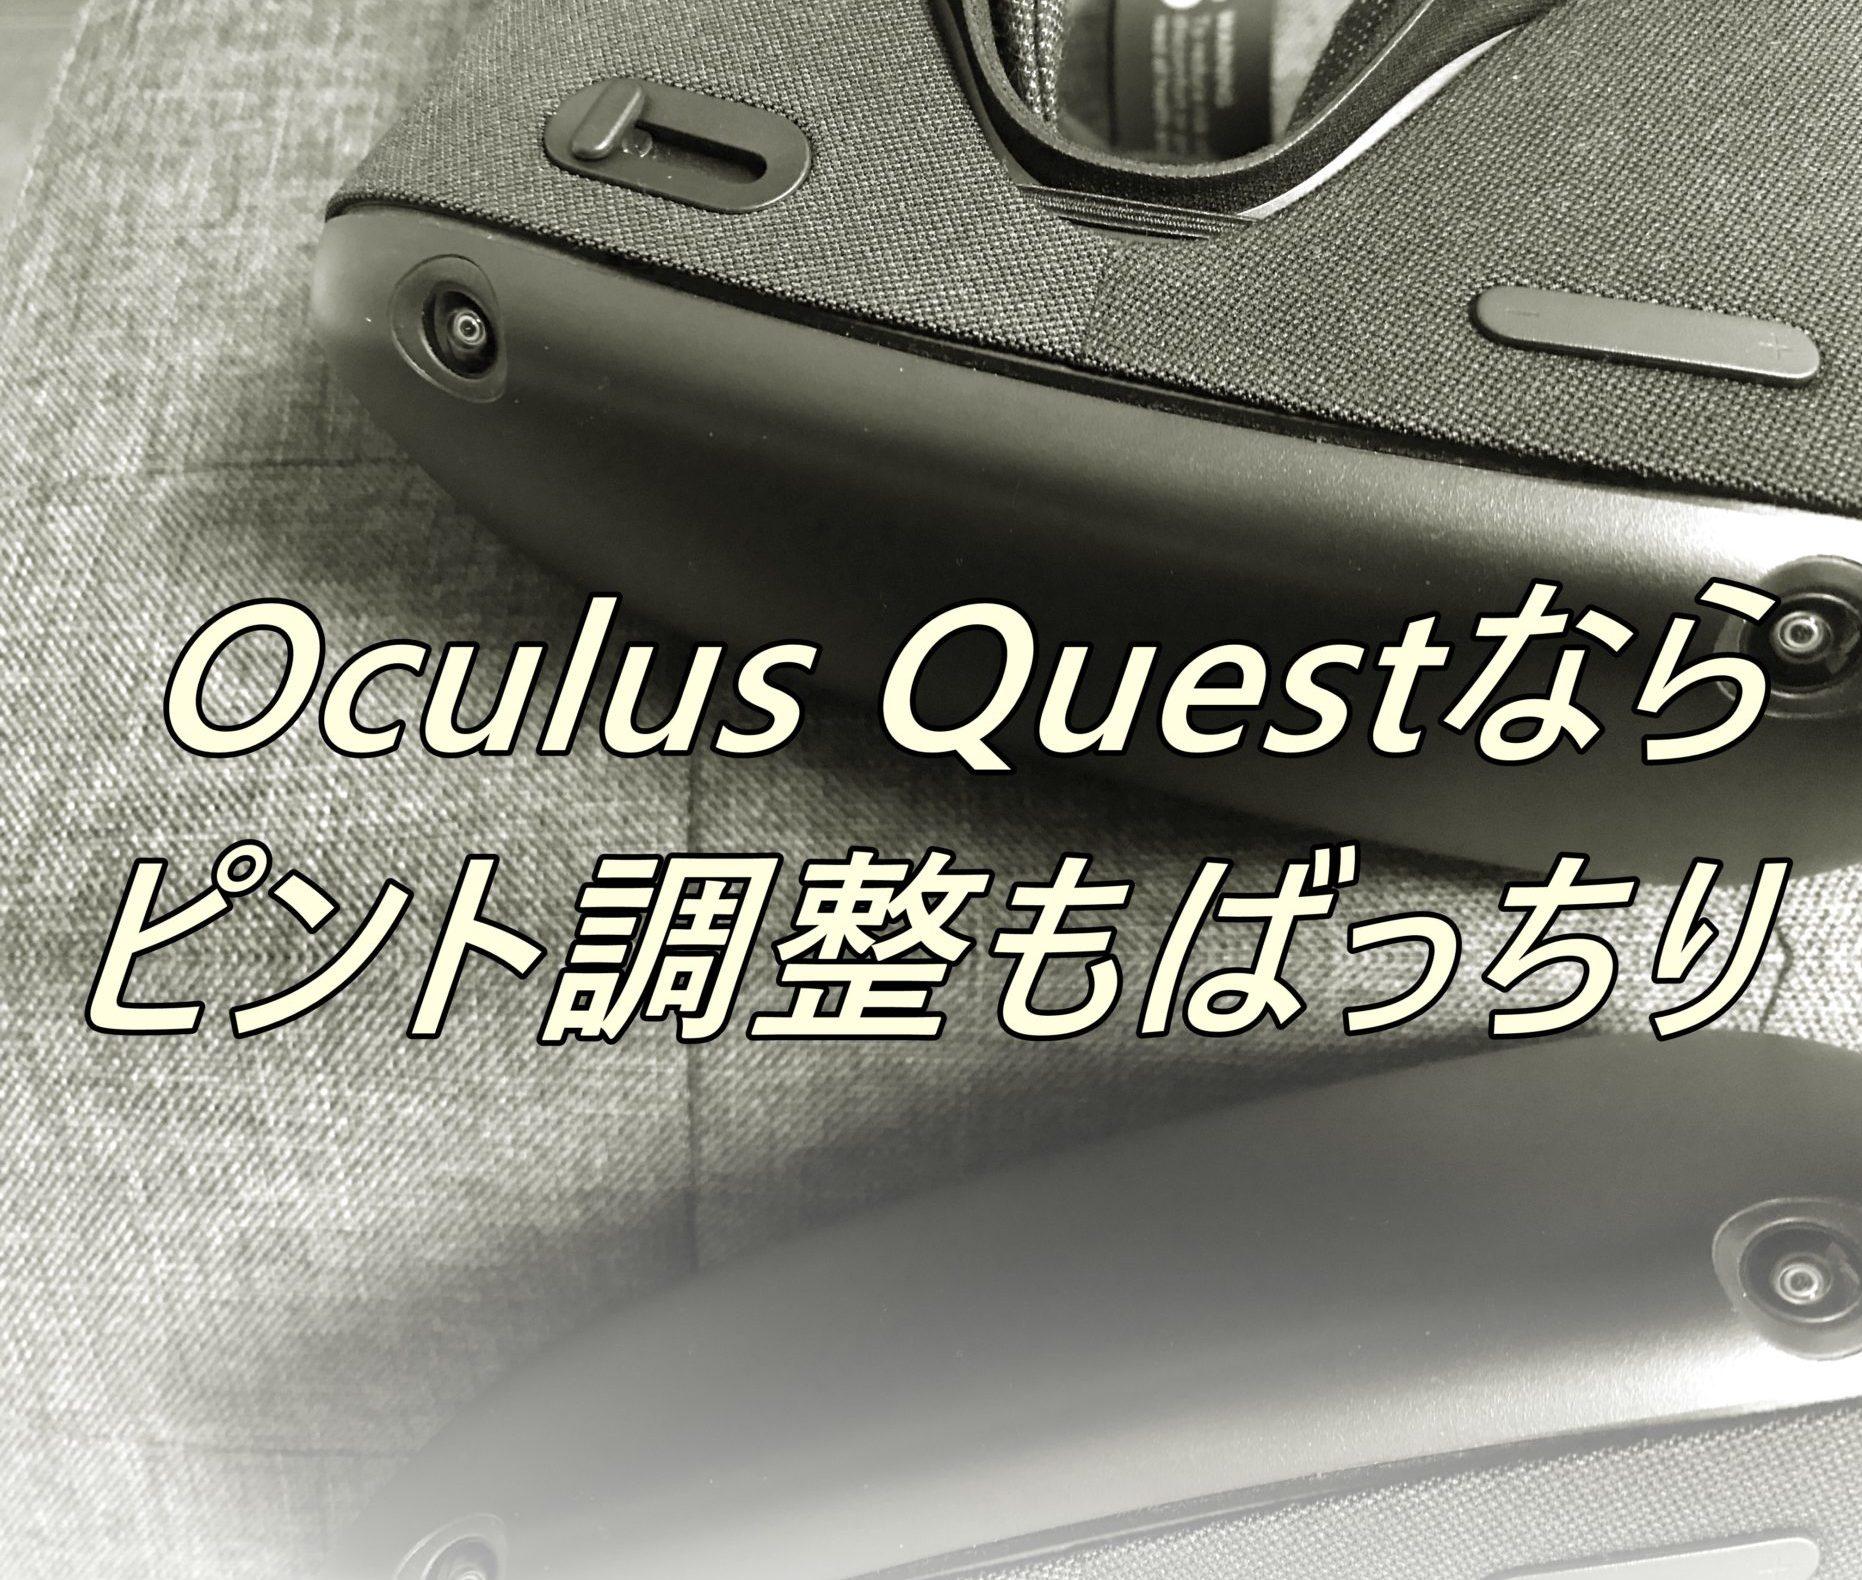 【Oculus Questピント調整】焦点をばっちり合わせる